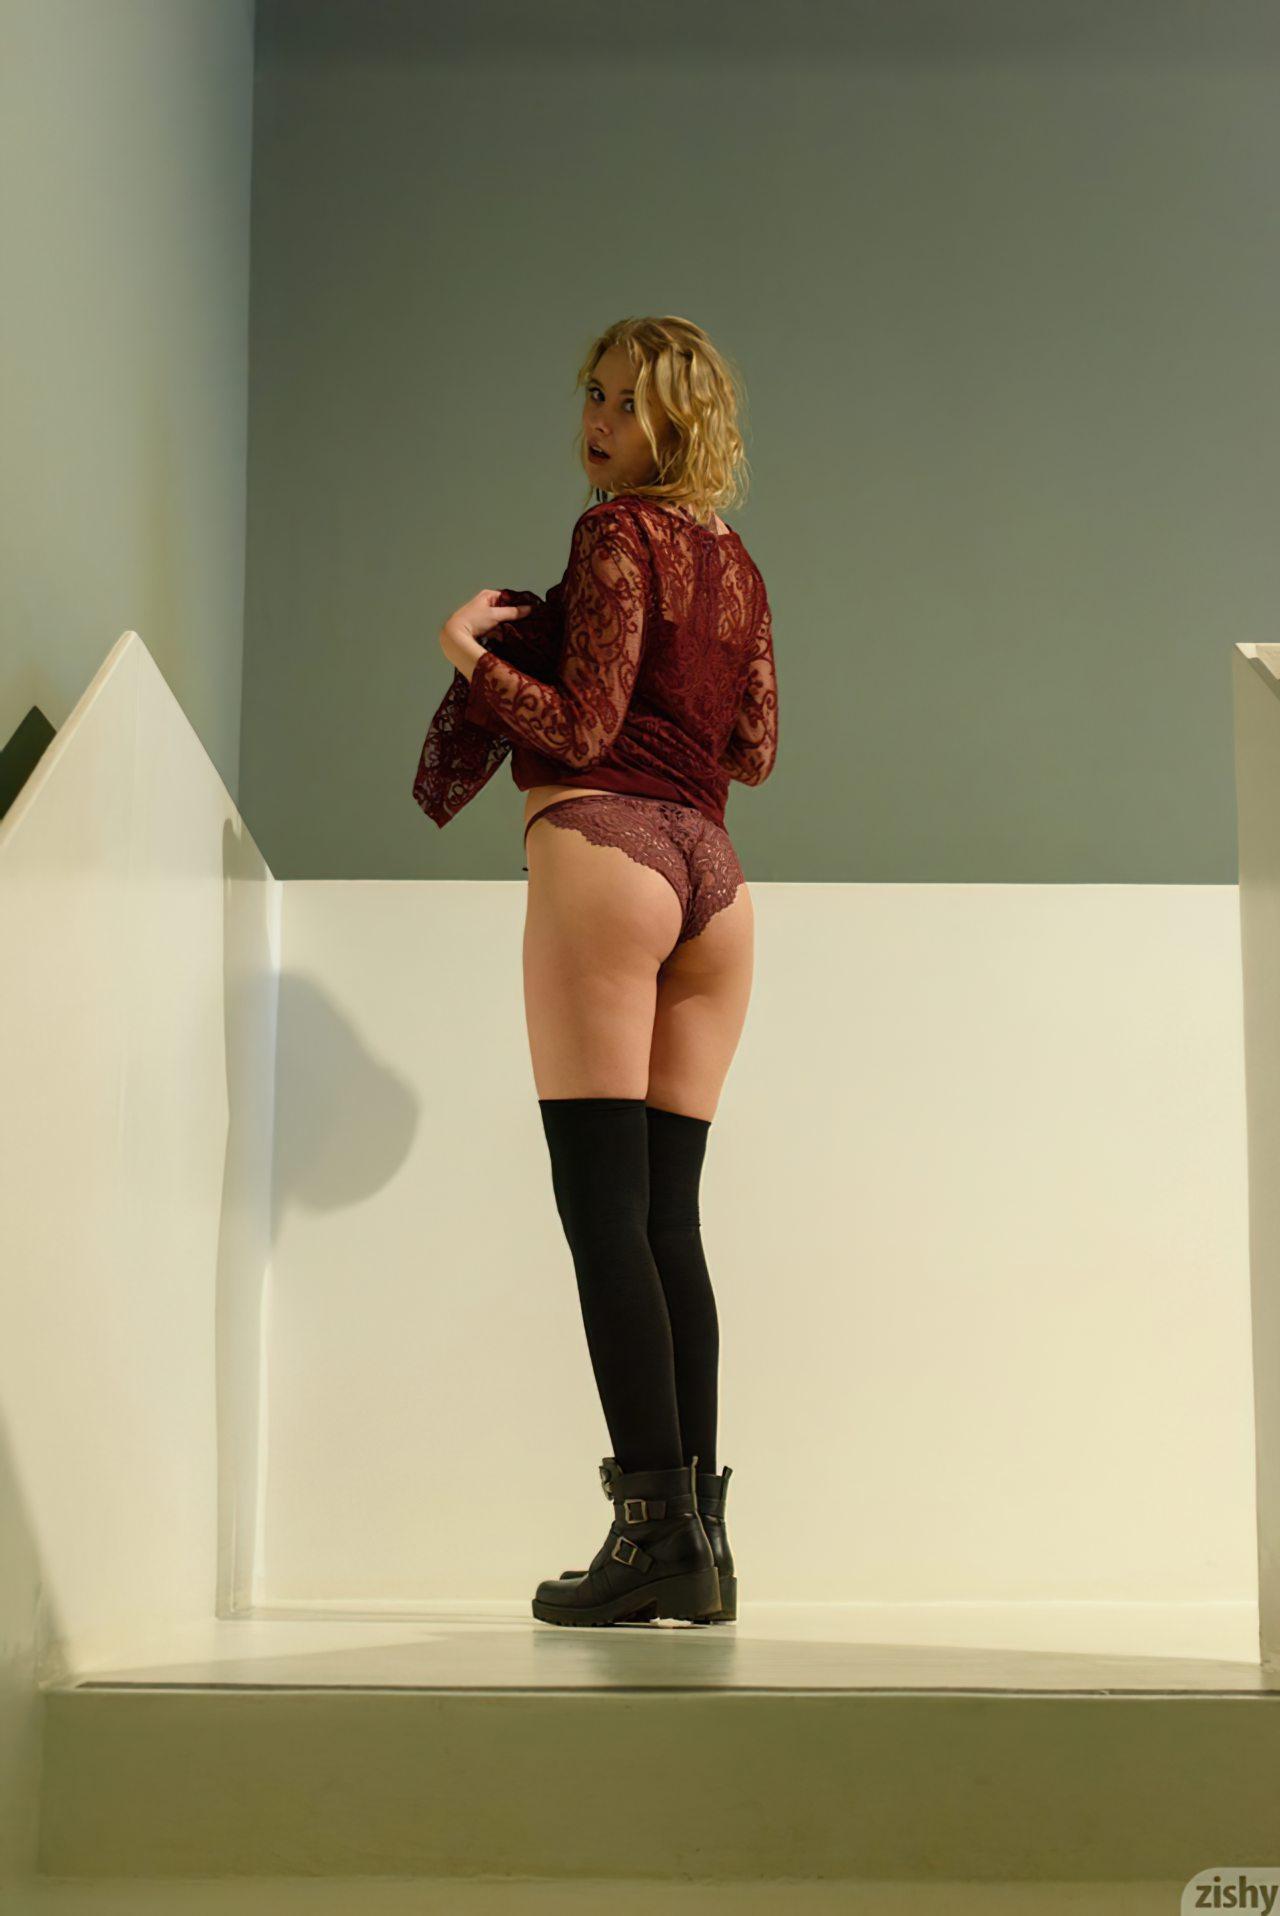 Visita ao Museu (2)